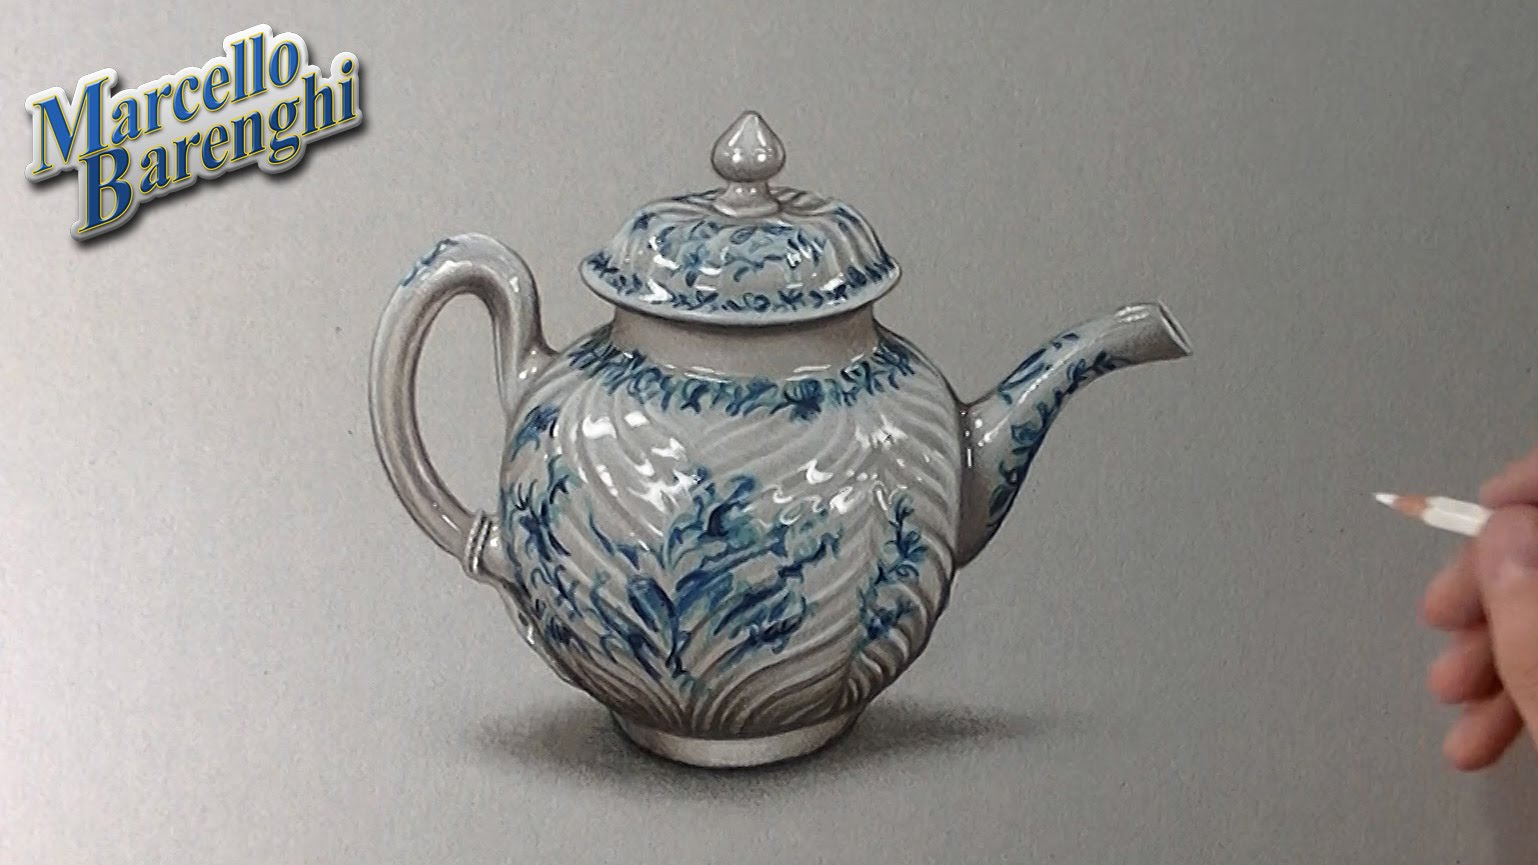 Drawn teapot porcelain How teapot to  a